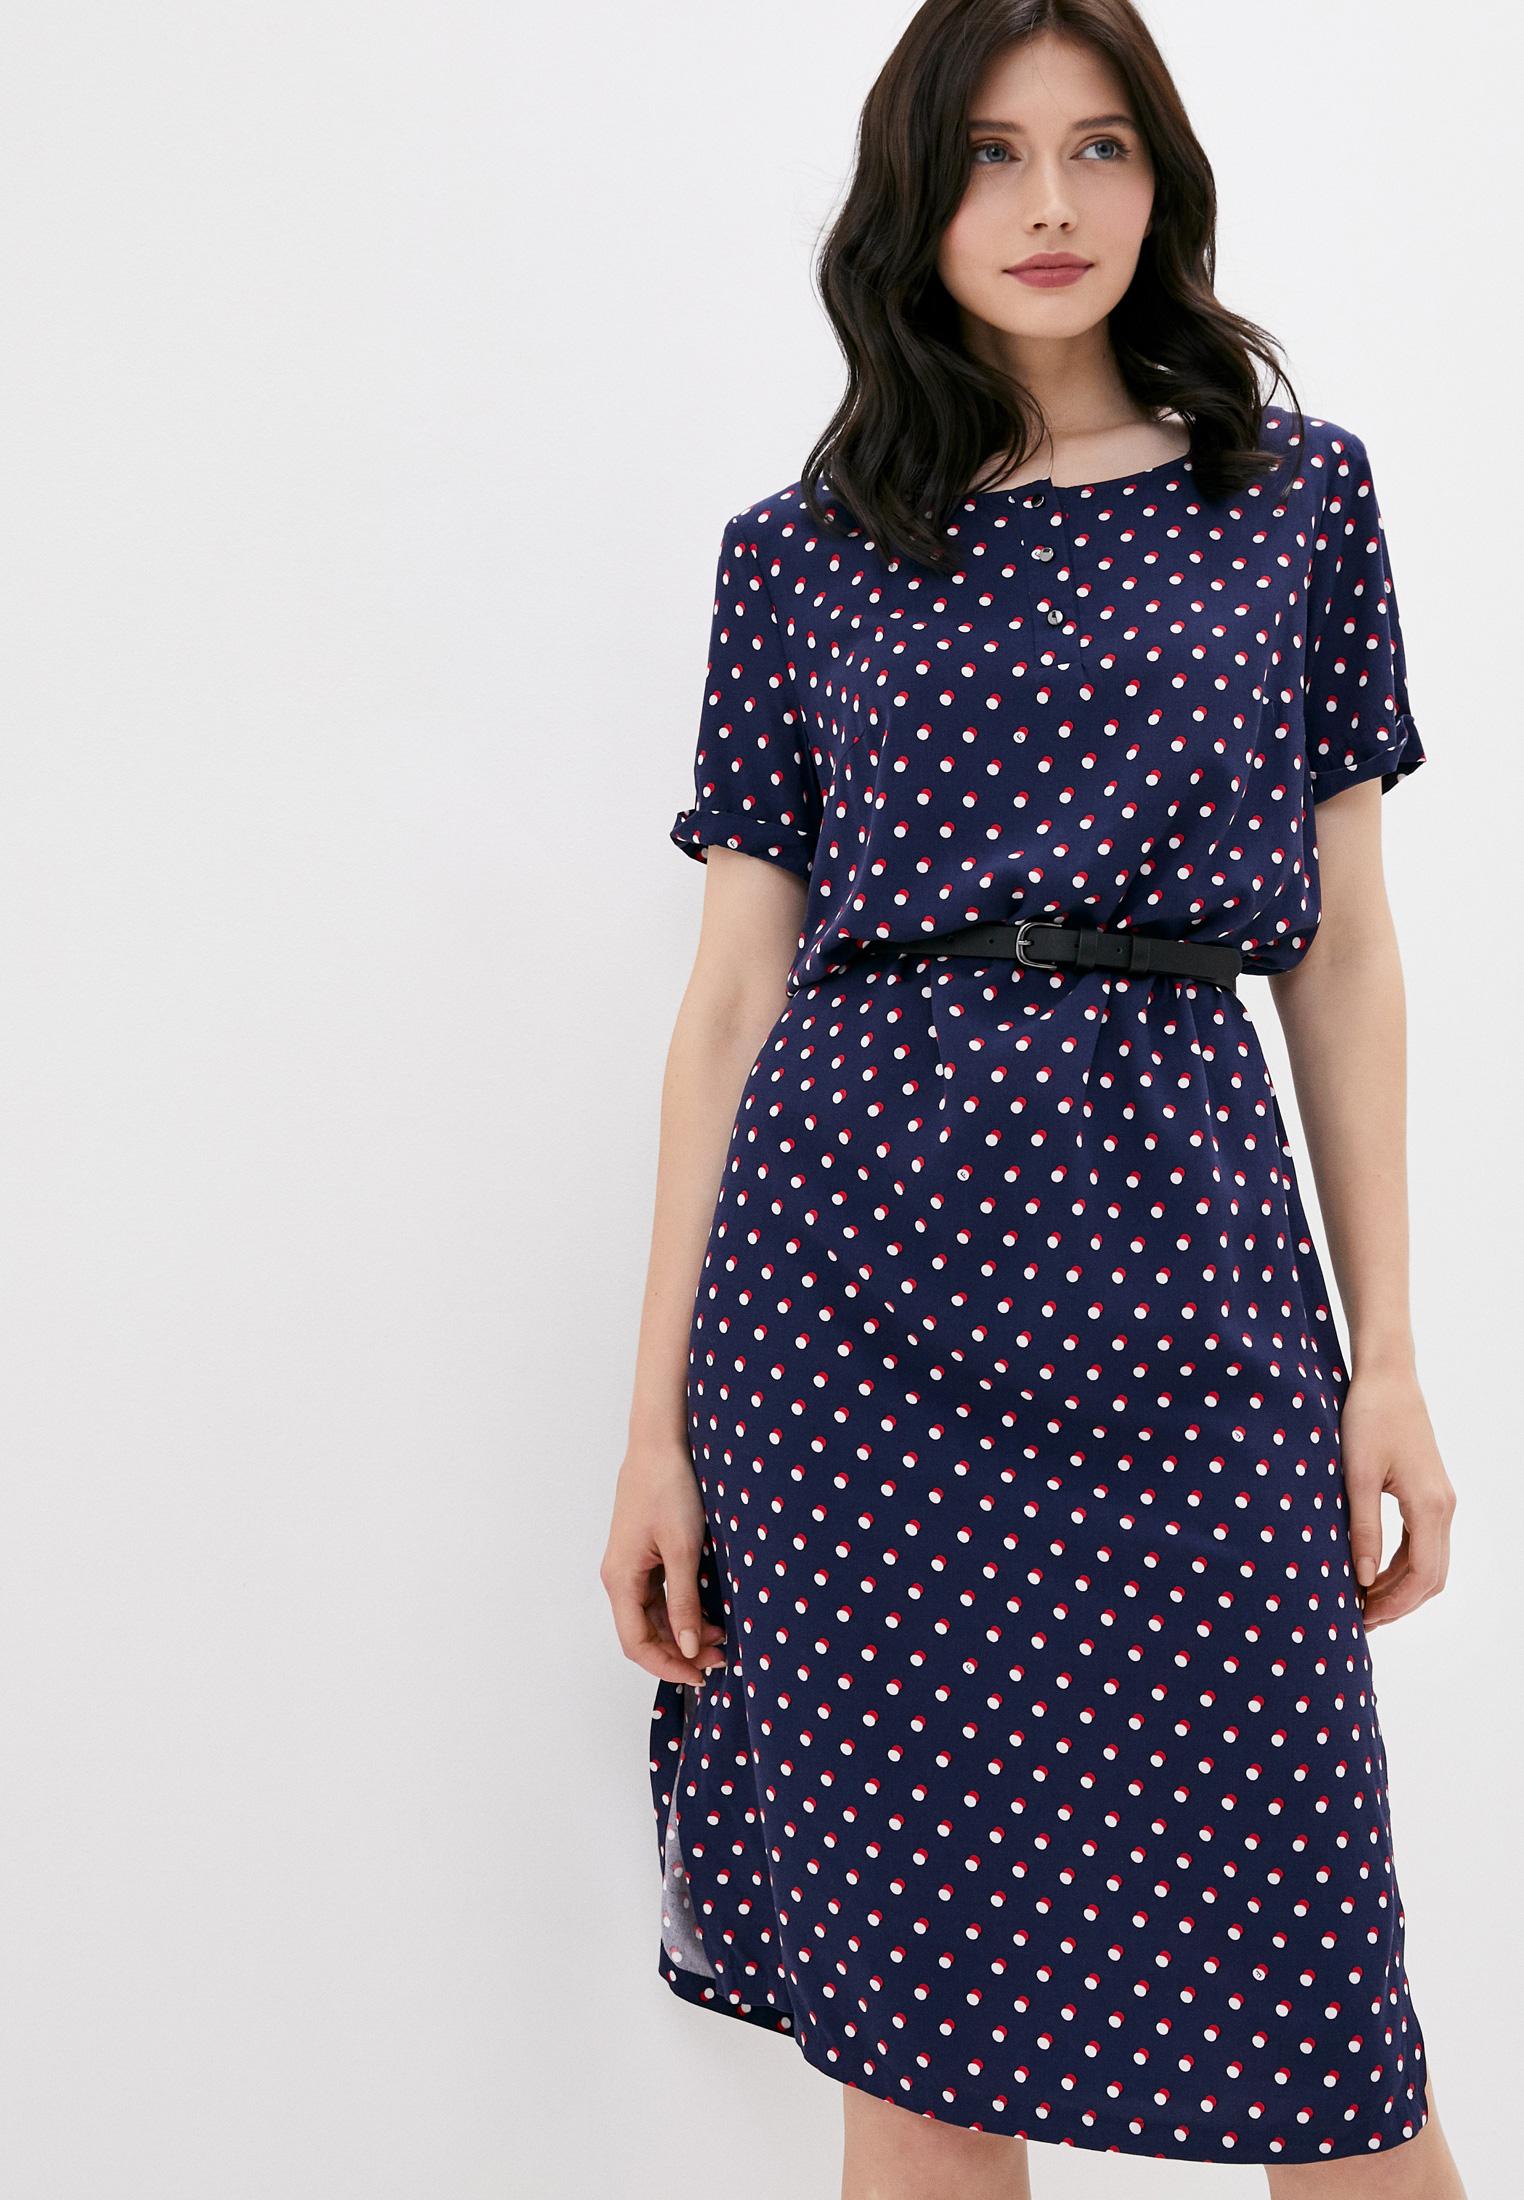 Повседневное платье Finn Flare (Фин Флаер) S19-11040